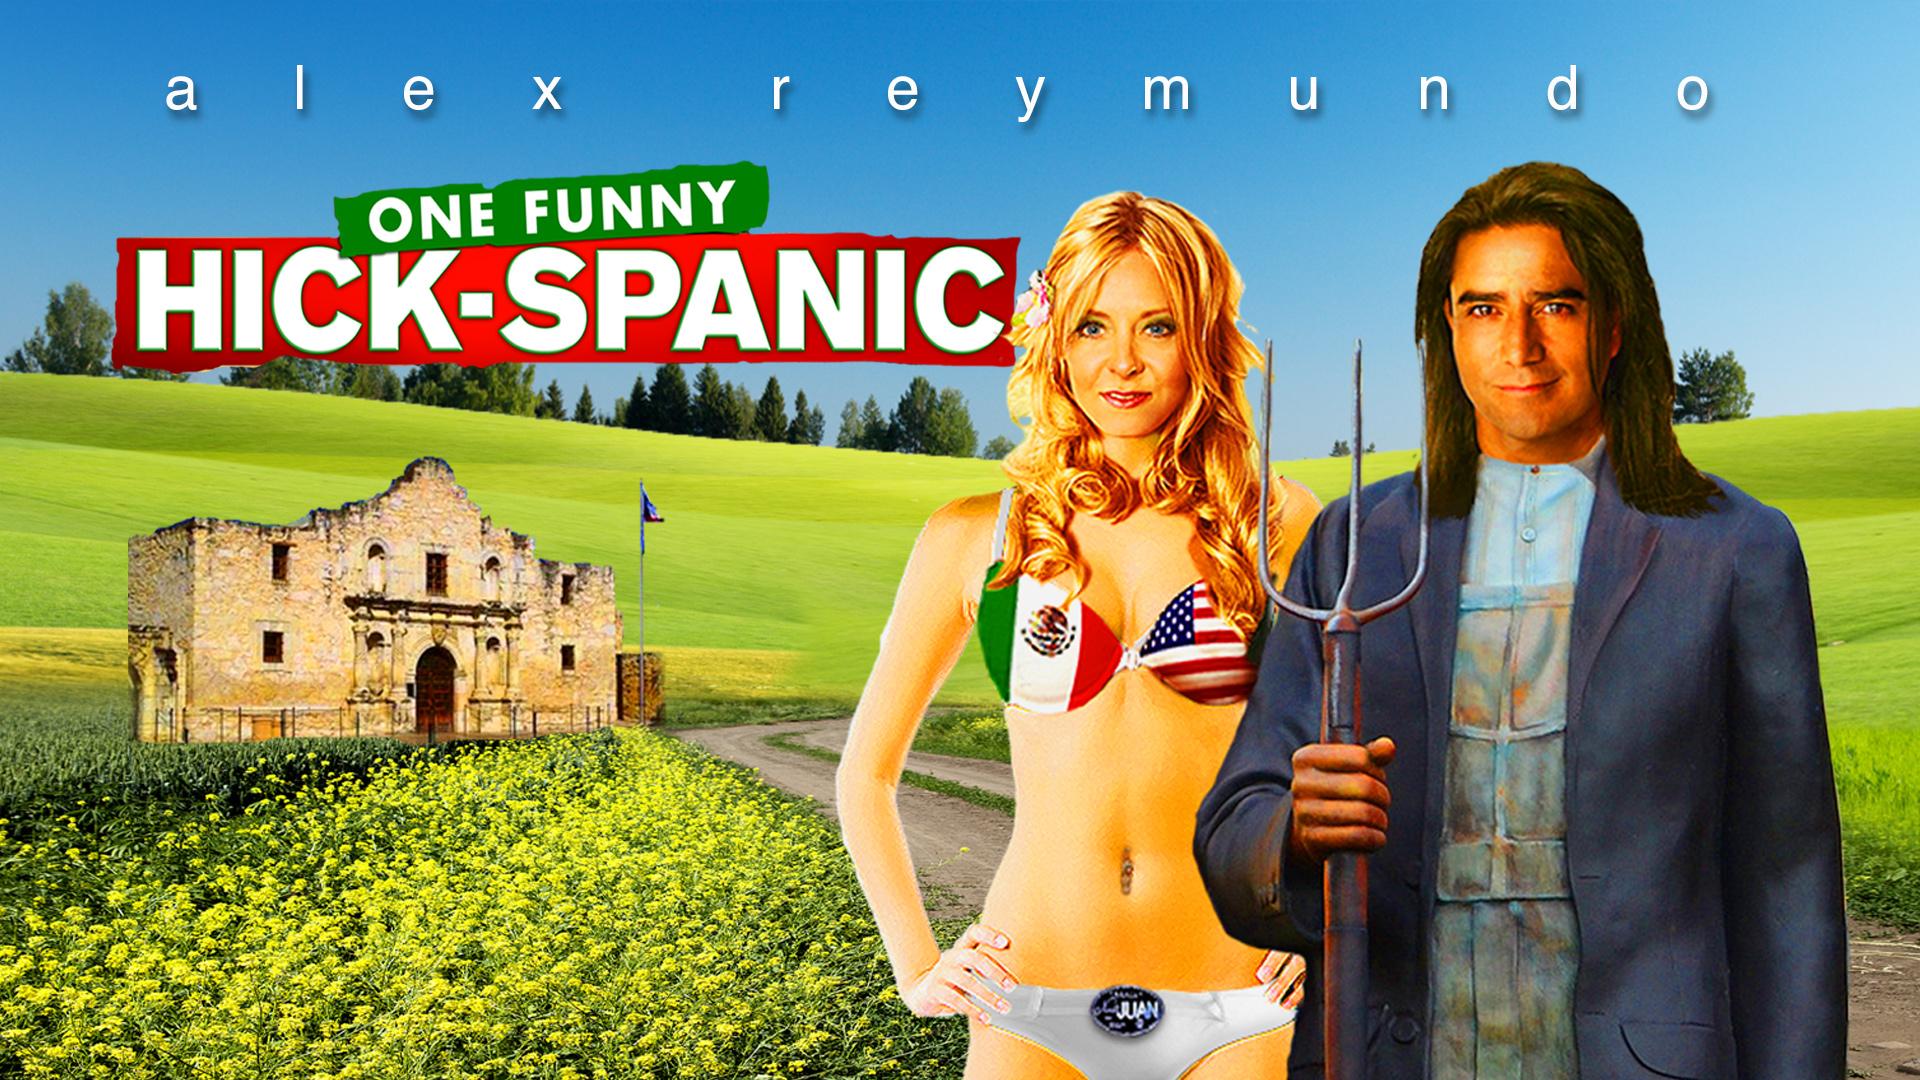 Alex Reymundo Hick-Spanic